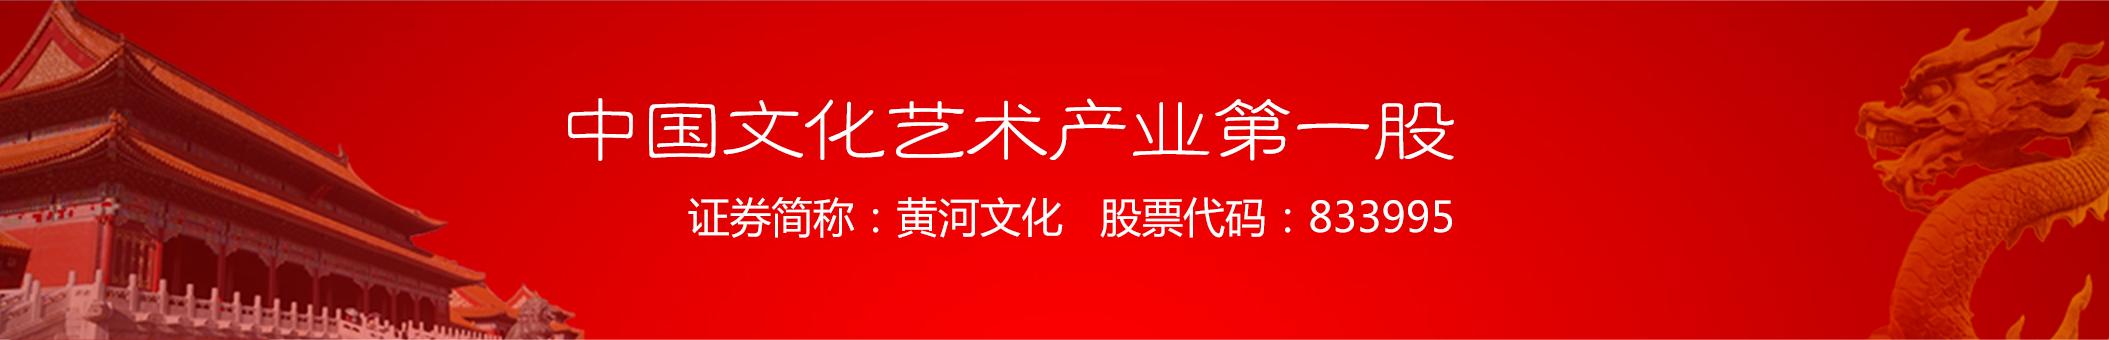 出山网视频 banner